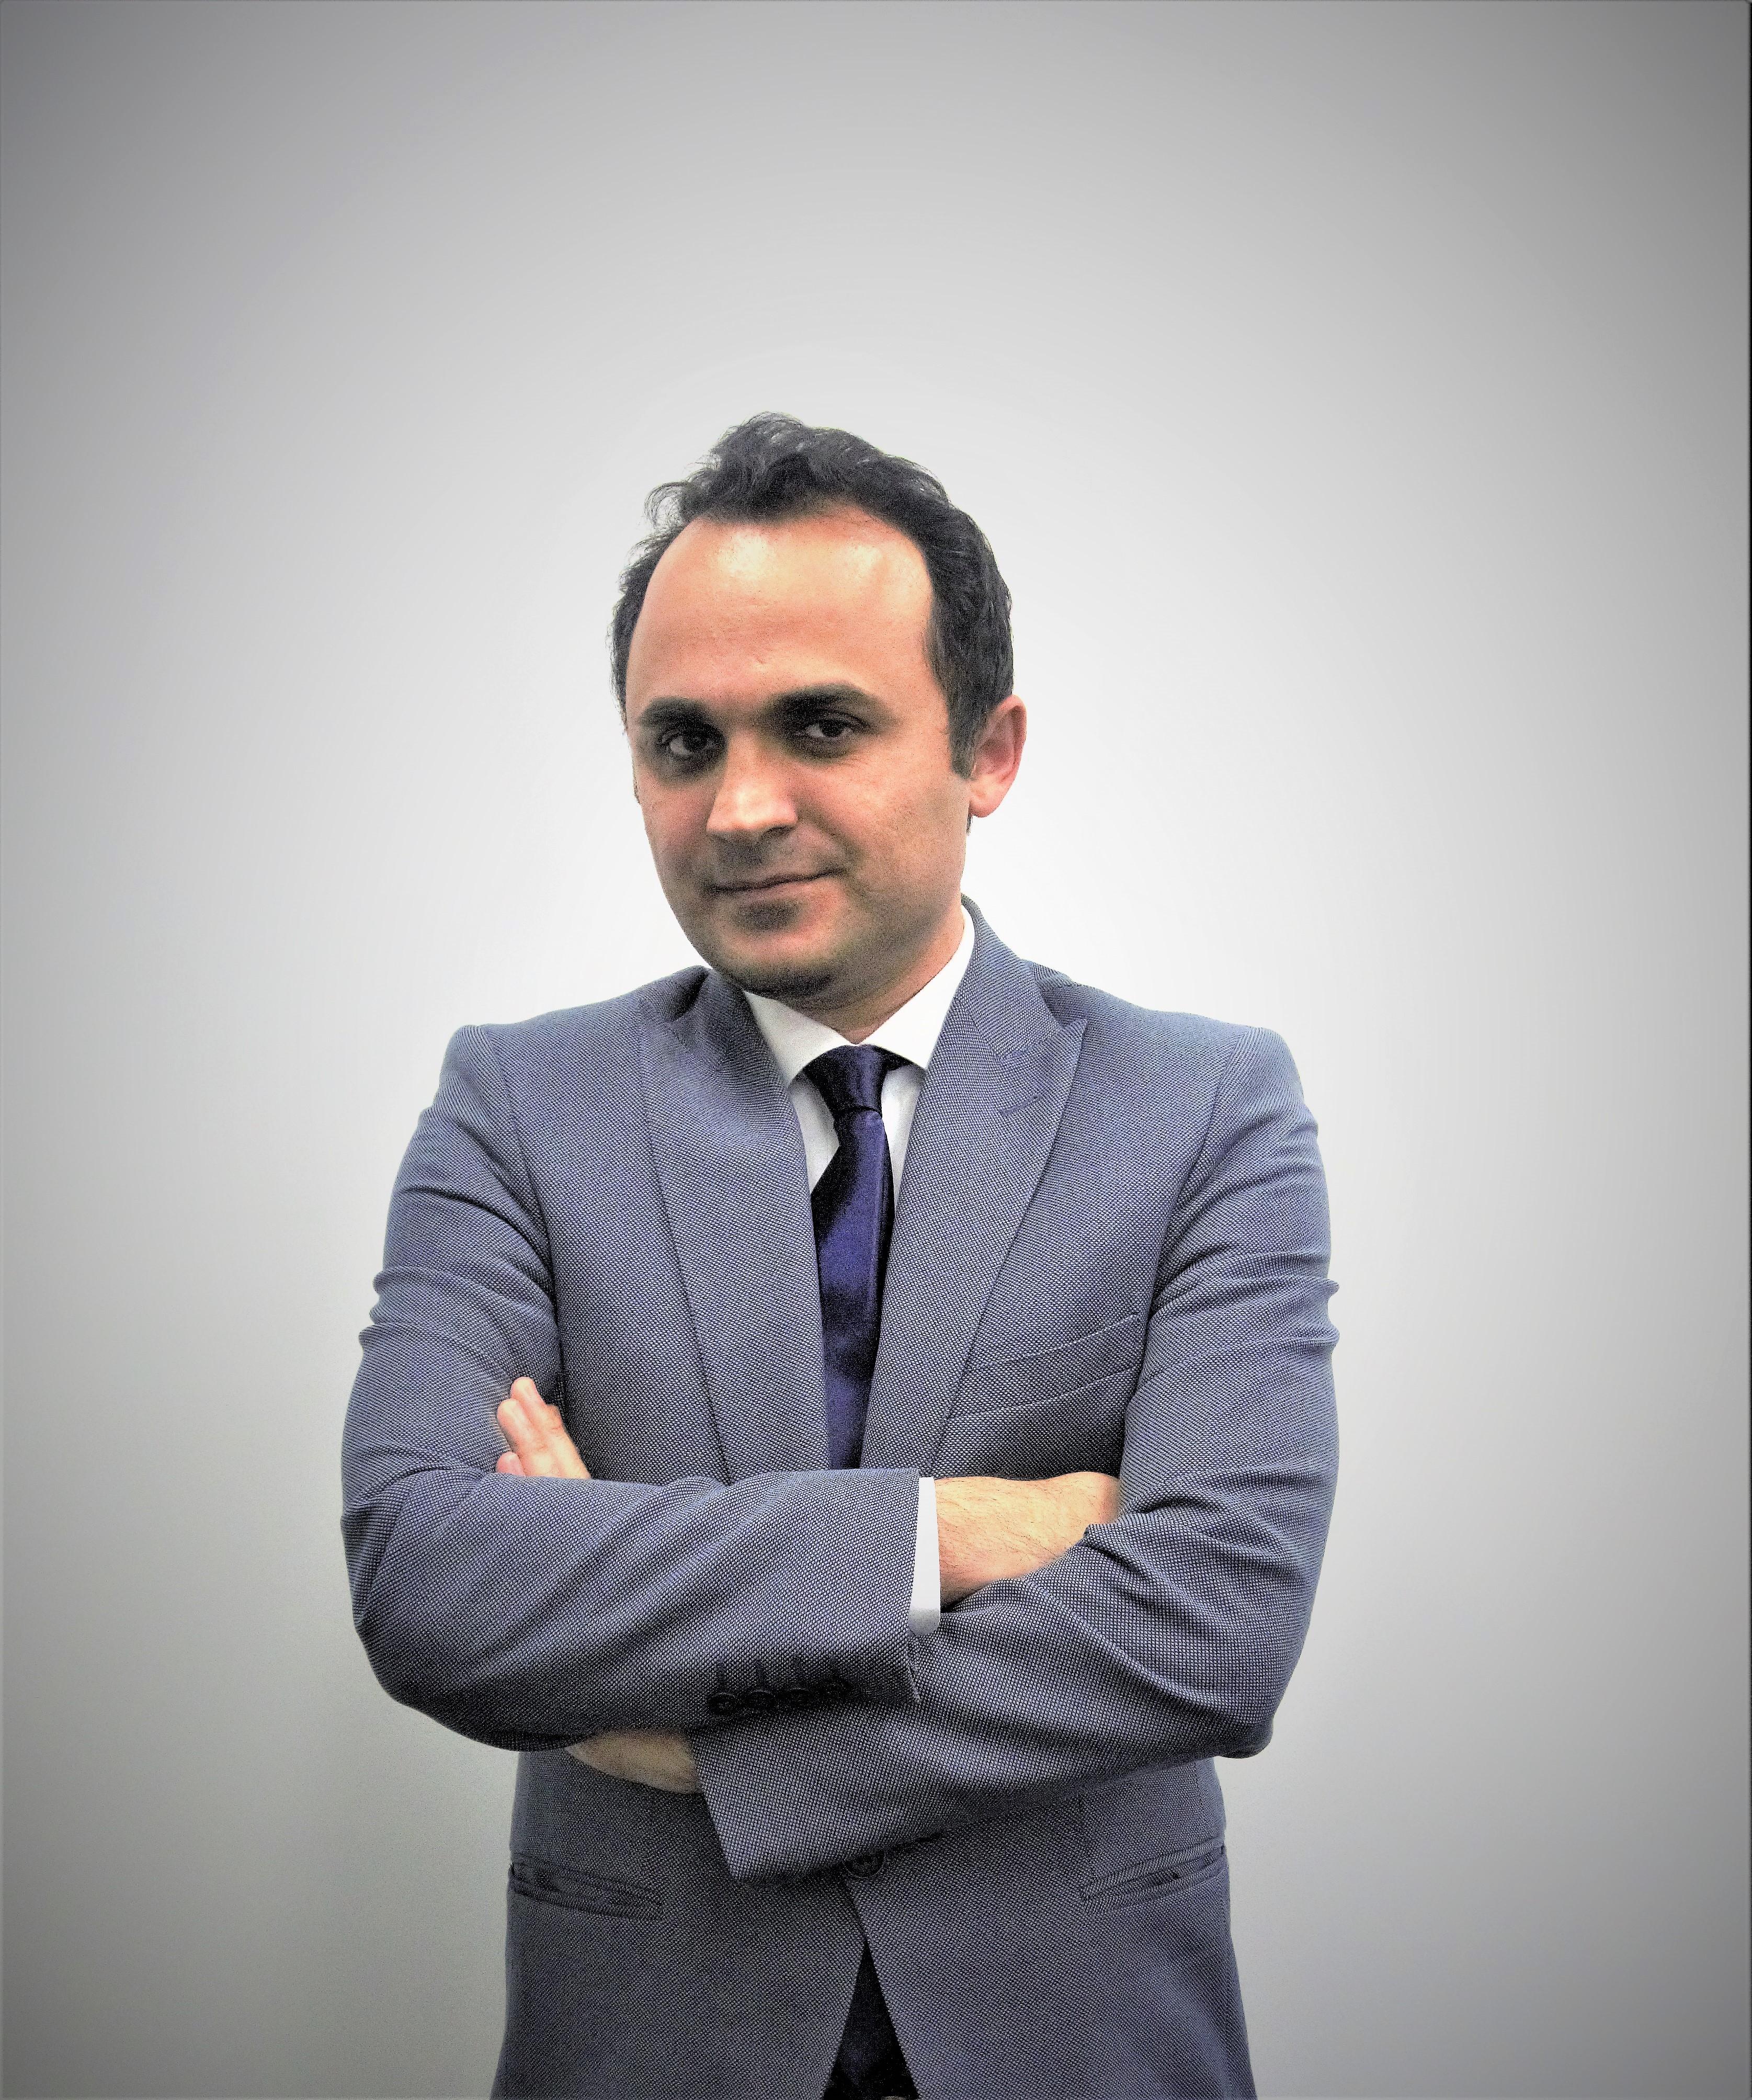 Farzad Shahmoradi